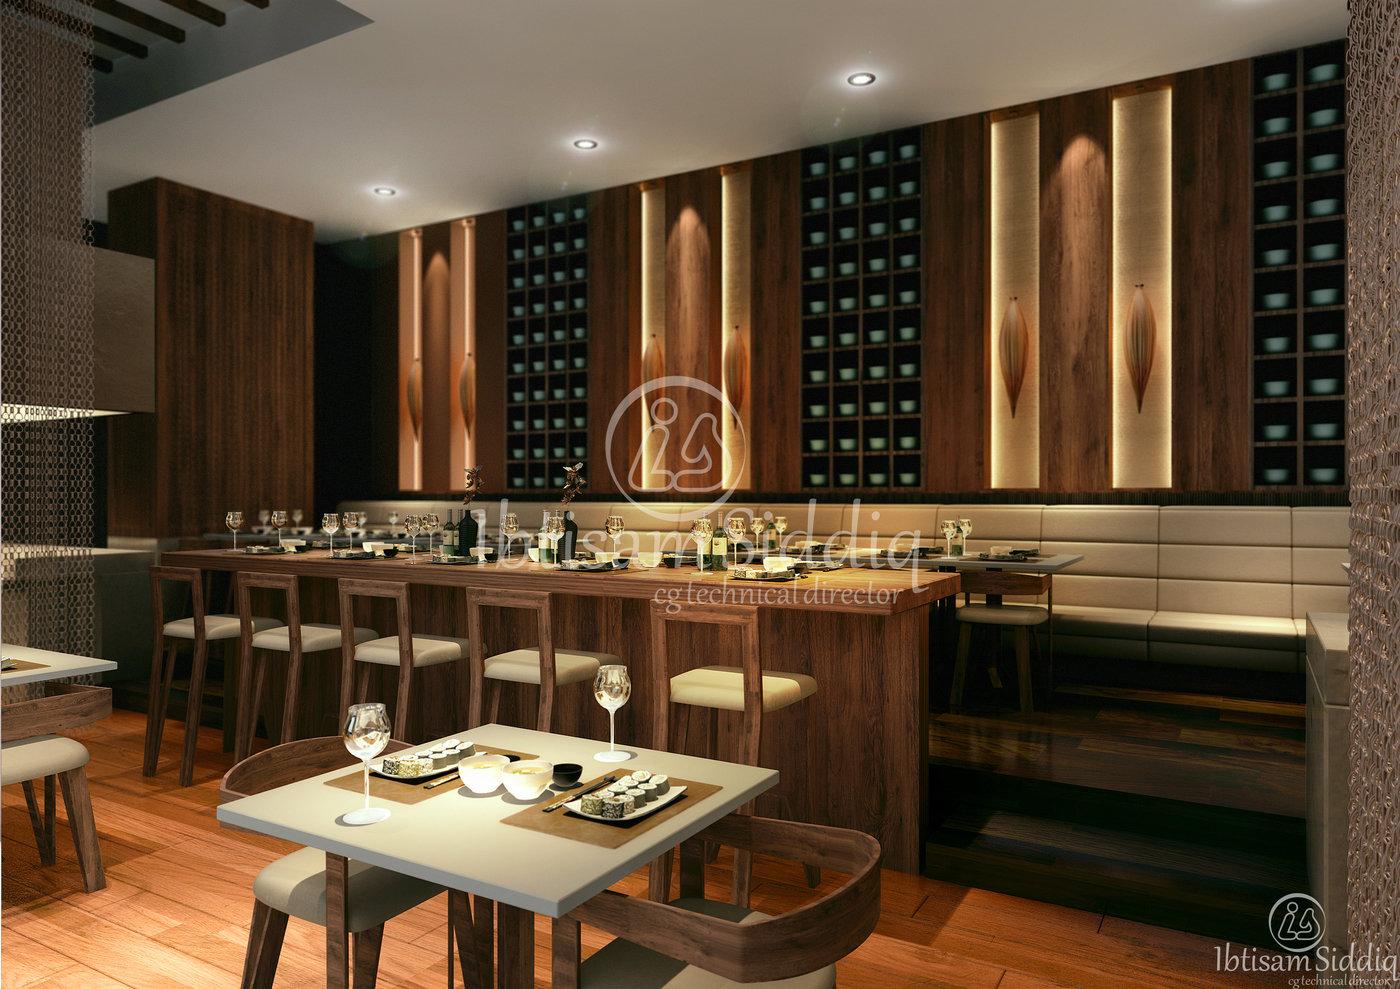 Japanese Restaurant - Hotel in Dubai by Ibtisaam Siddiq at